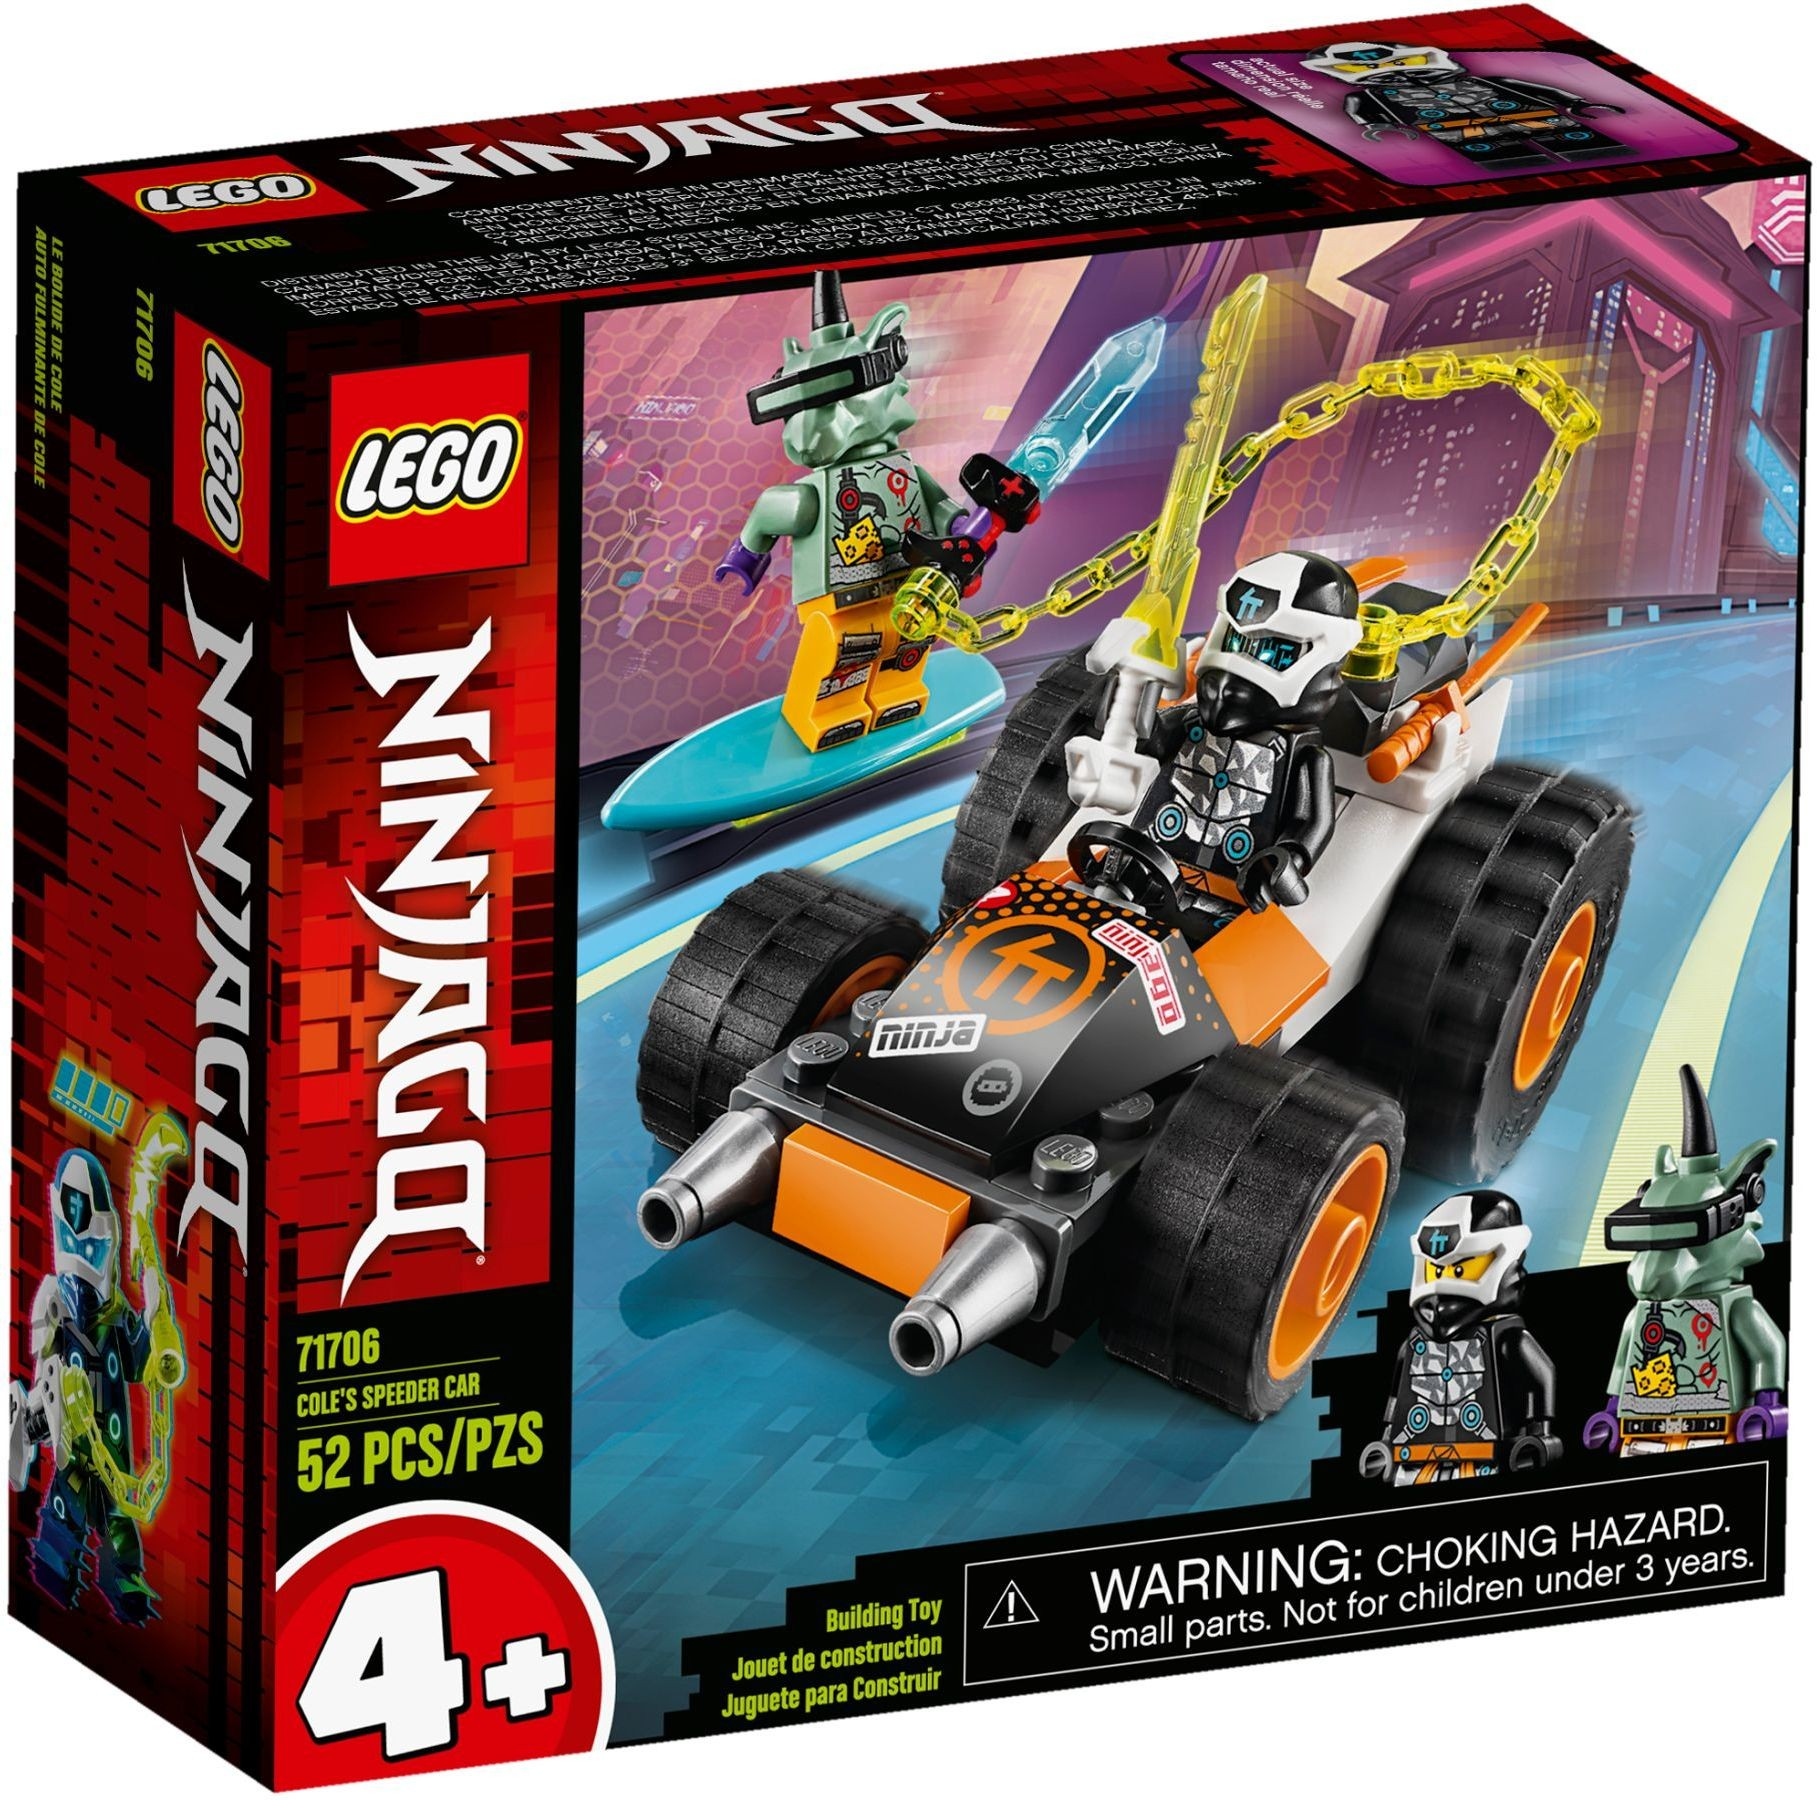 Kaufe LEGO Ninjago - Cole's Speeder Car (71706) - inkl. Versand